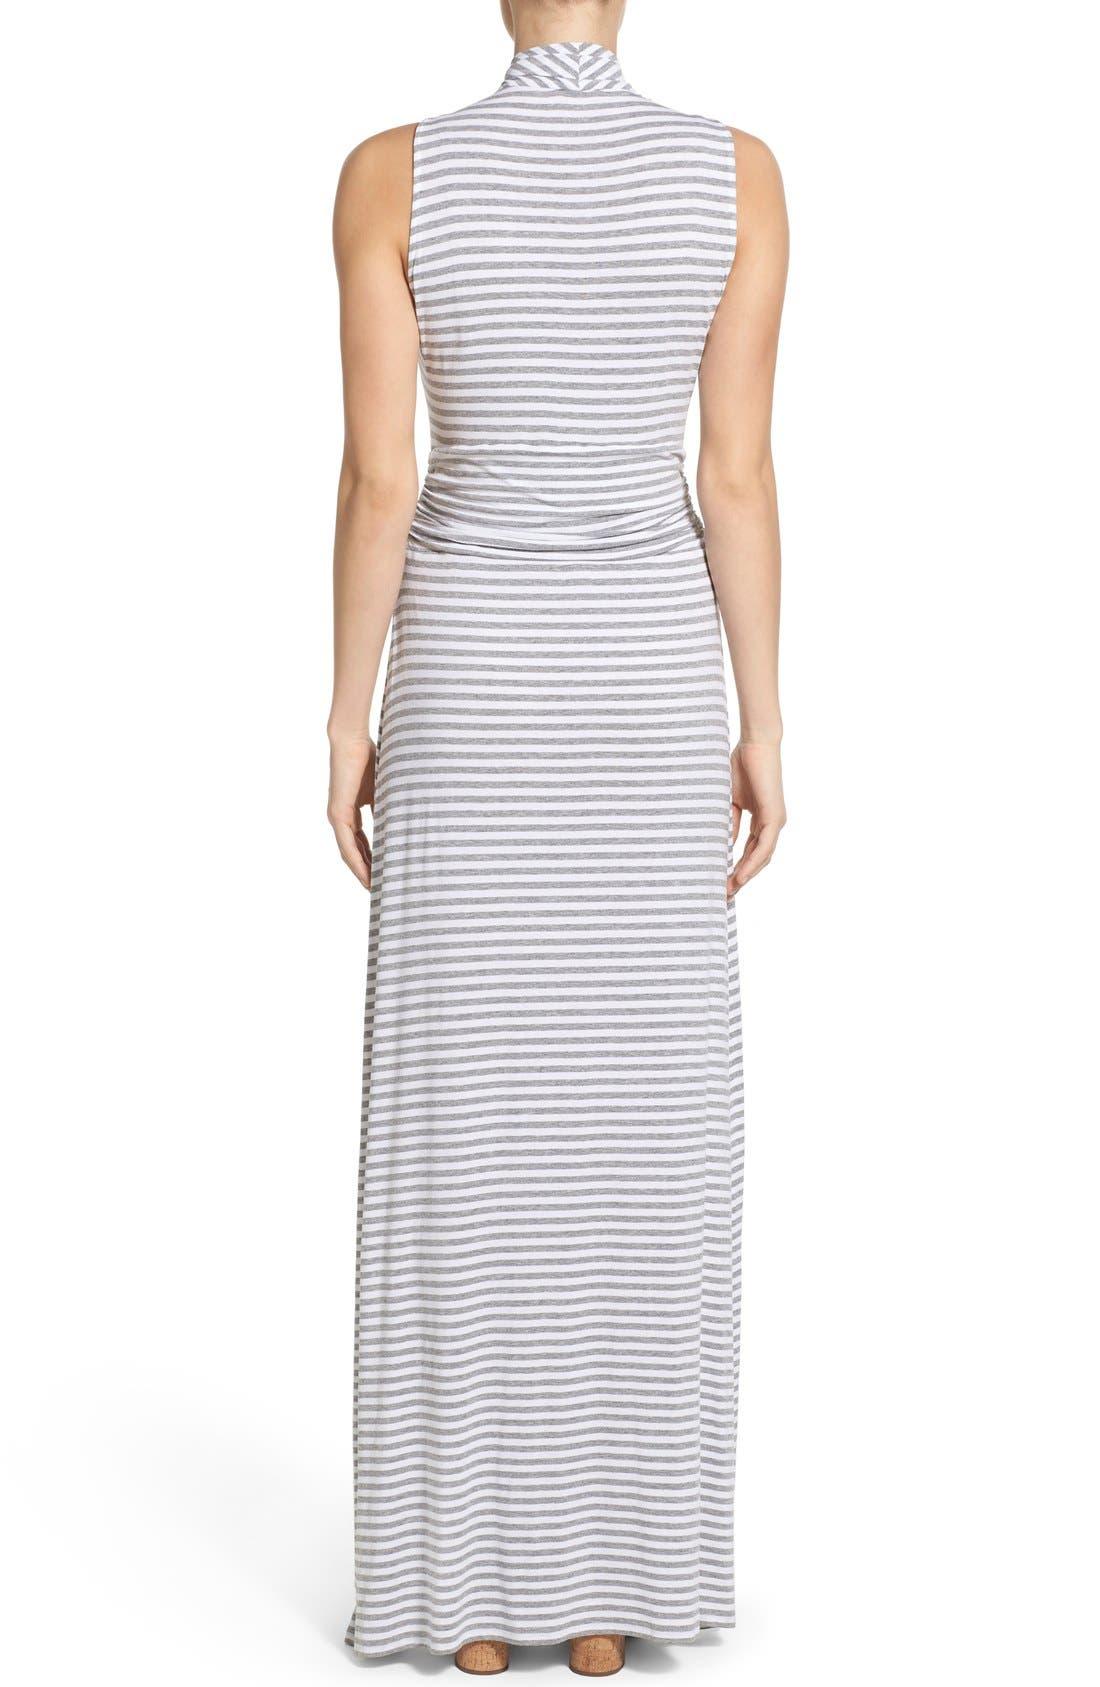 Alternate Image 2  - Vince Camuto Stripe Jersey Cutaway Shoulder Maxi Dress (Petite)